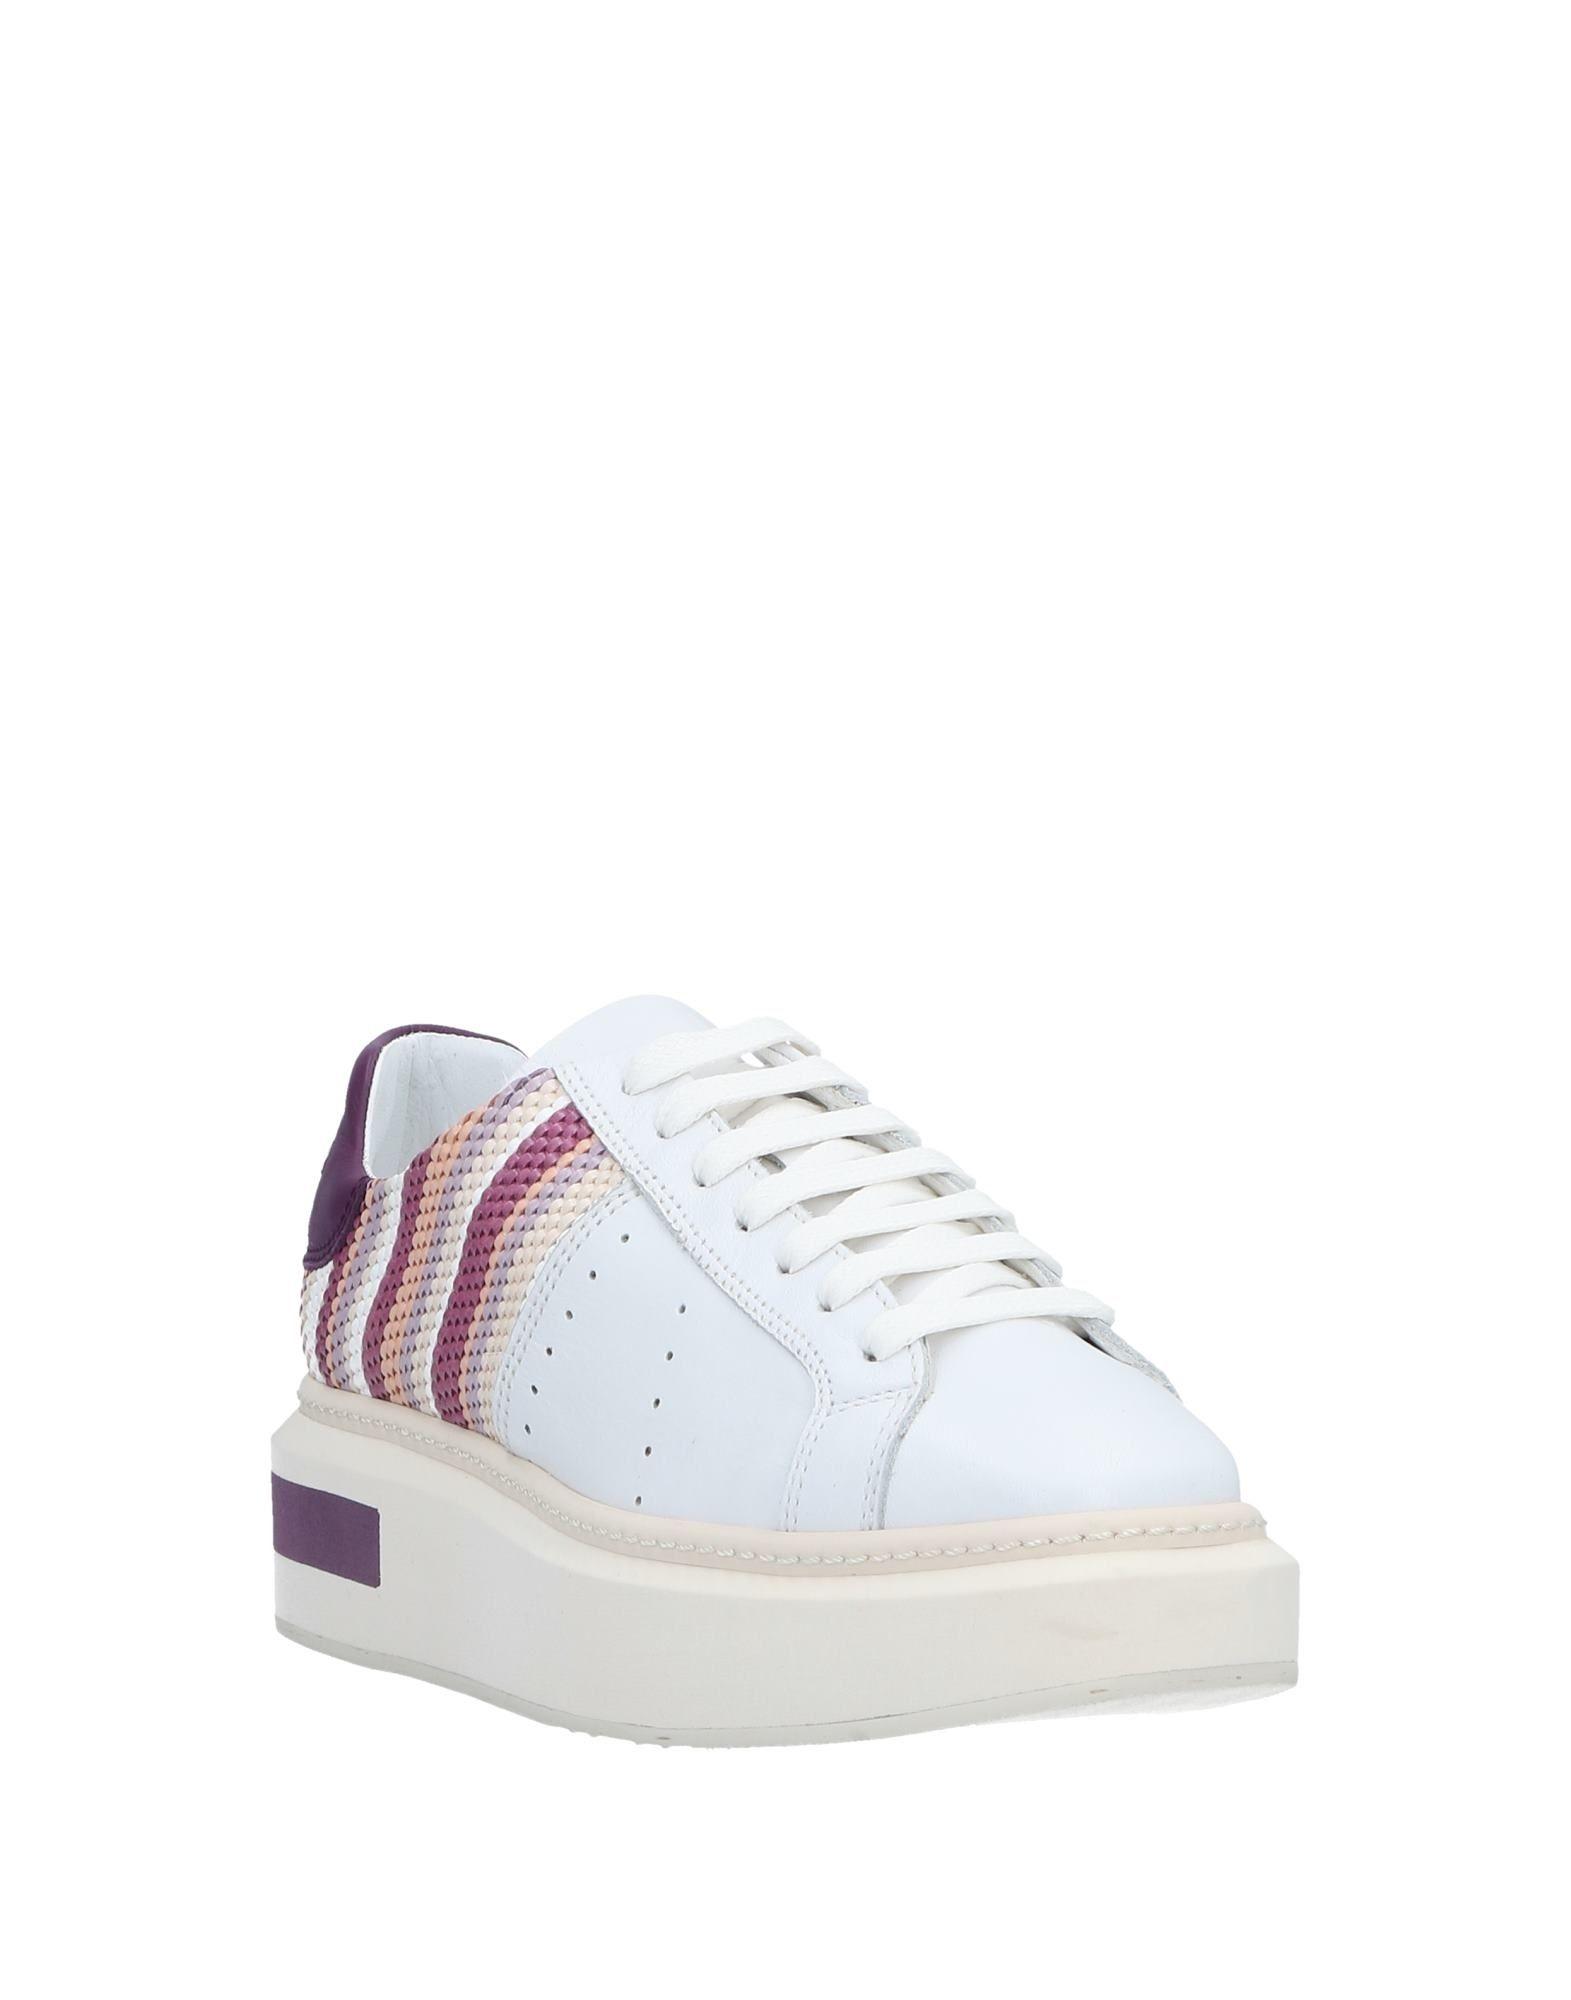 Manuel Barceló Damen Sneakers Damen Barceló  11539016XH 96c8db